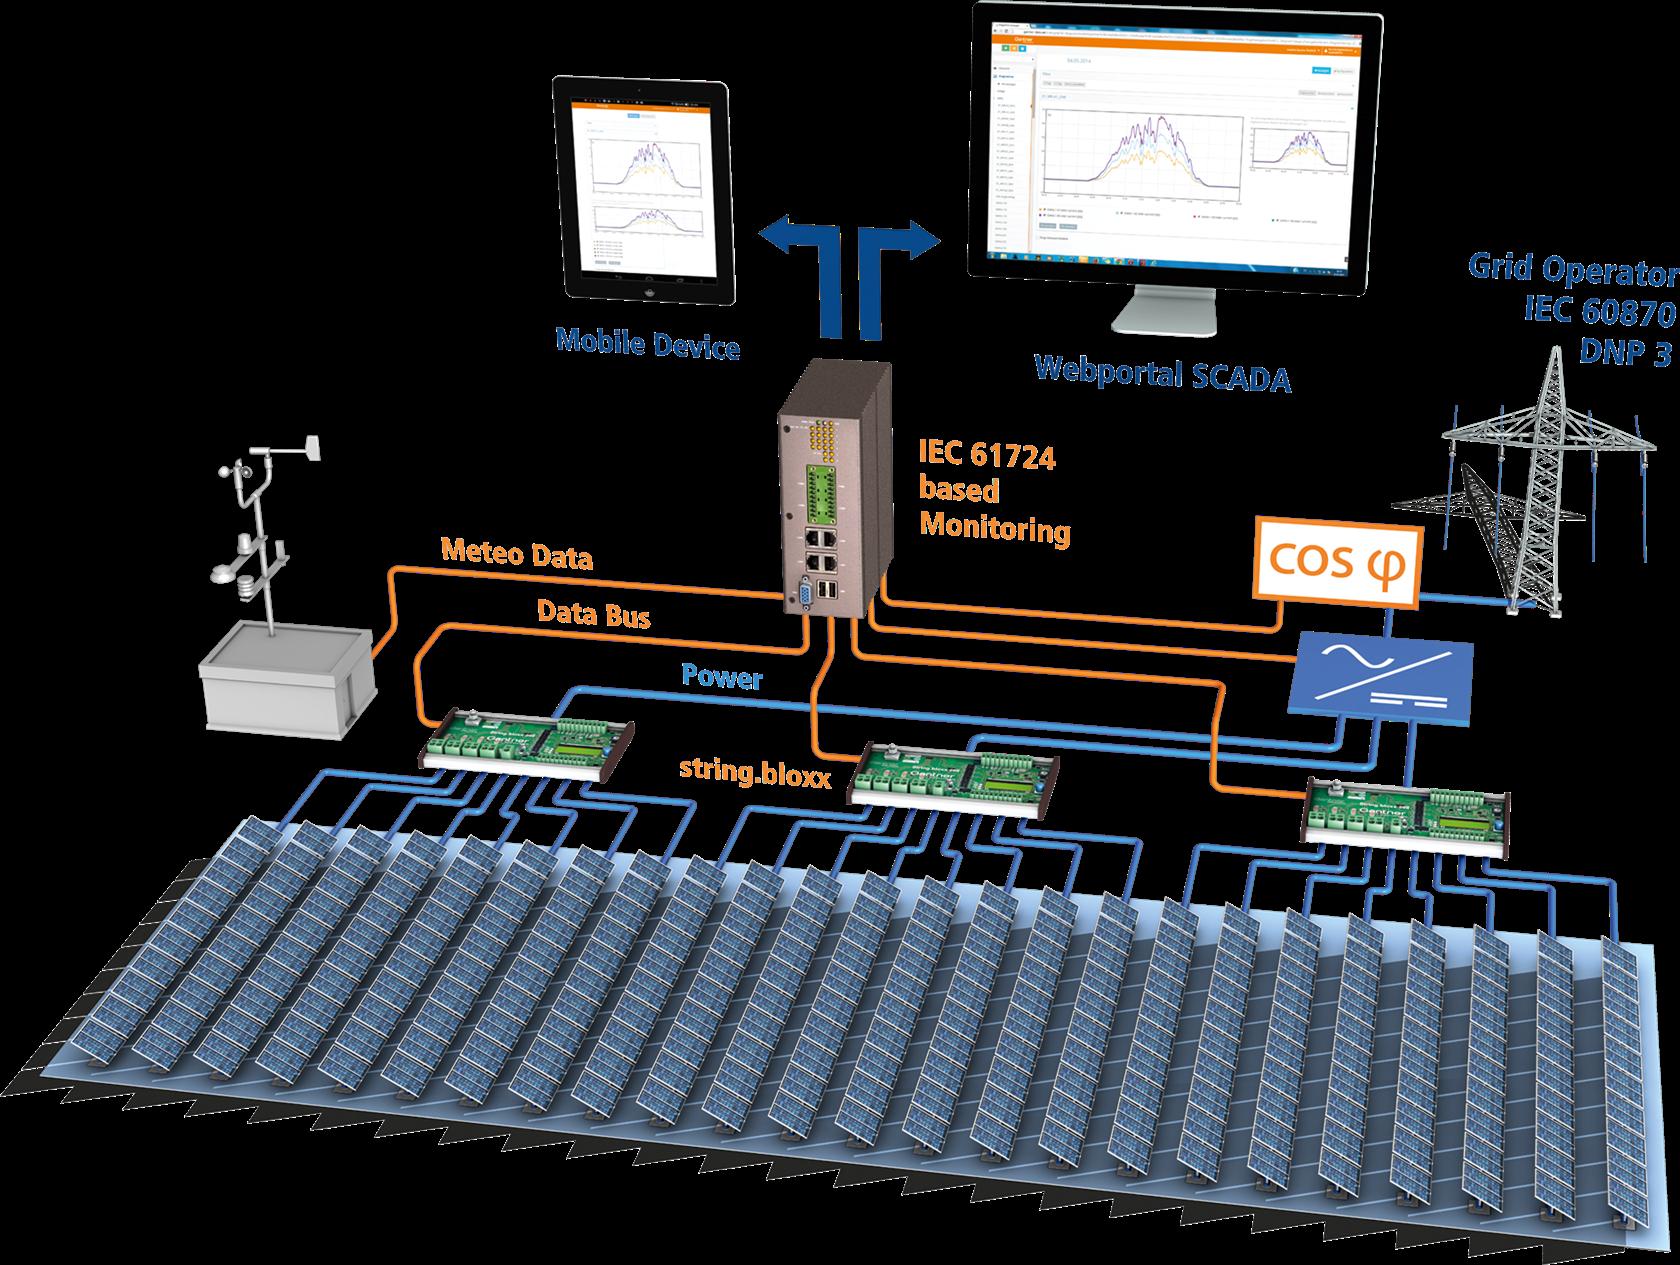 Https Attachments Details 802479 Cdnitroot D010 Led Driver Wiring Diagram 02 Gantner Monitoring Concept